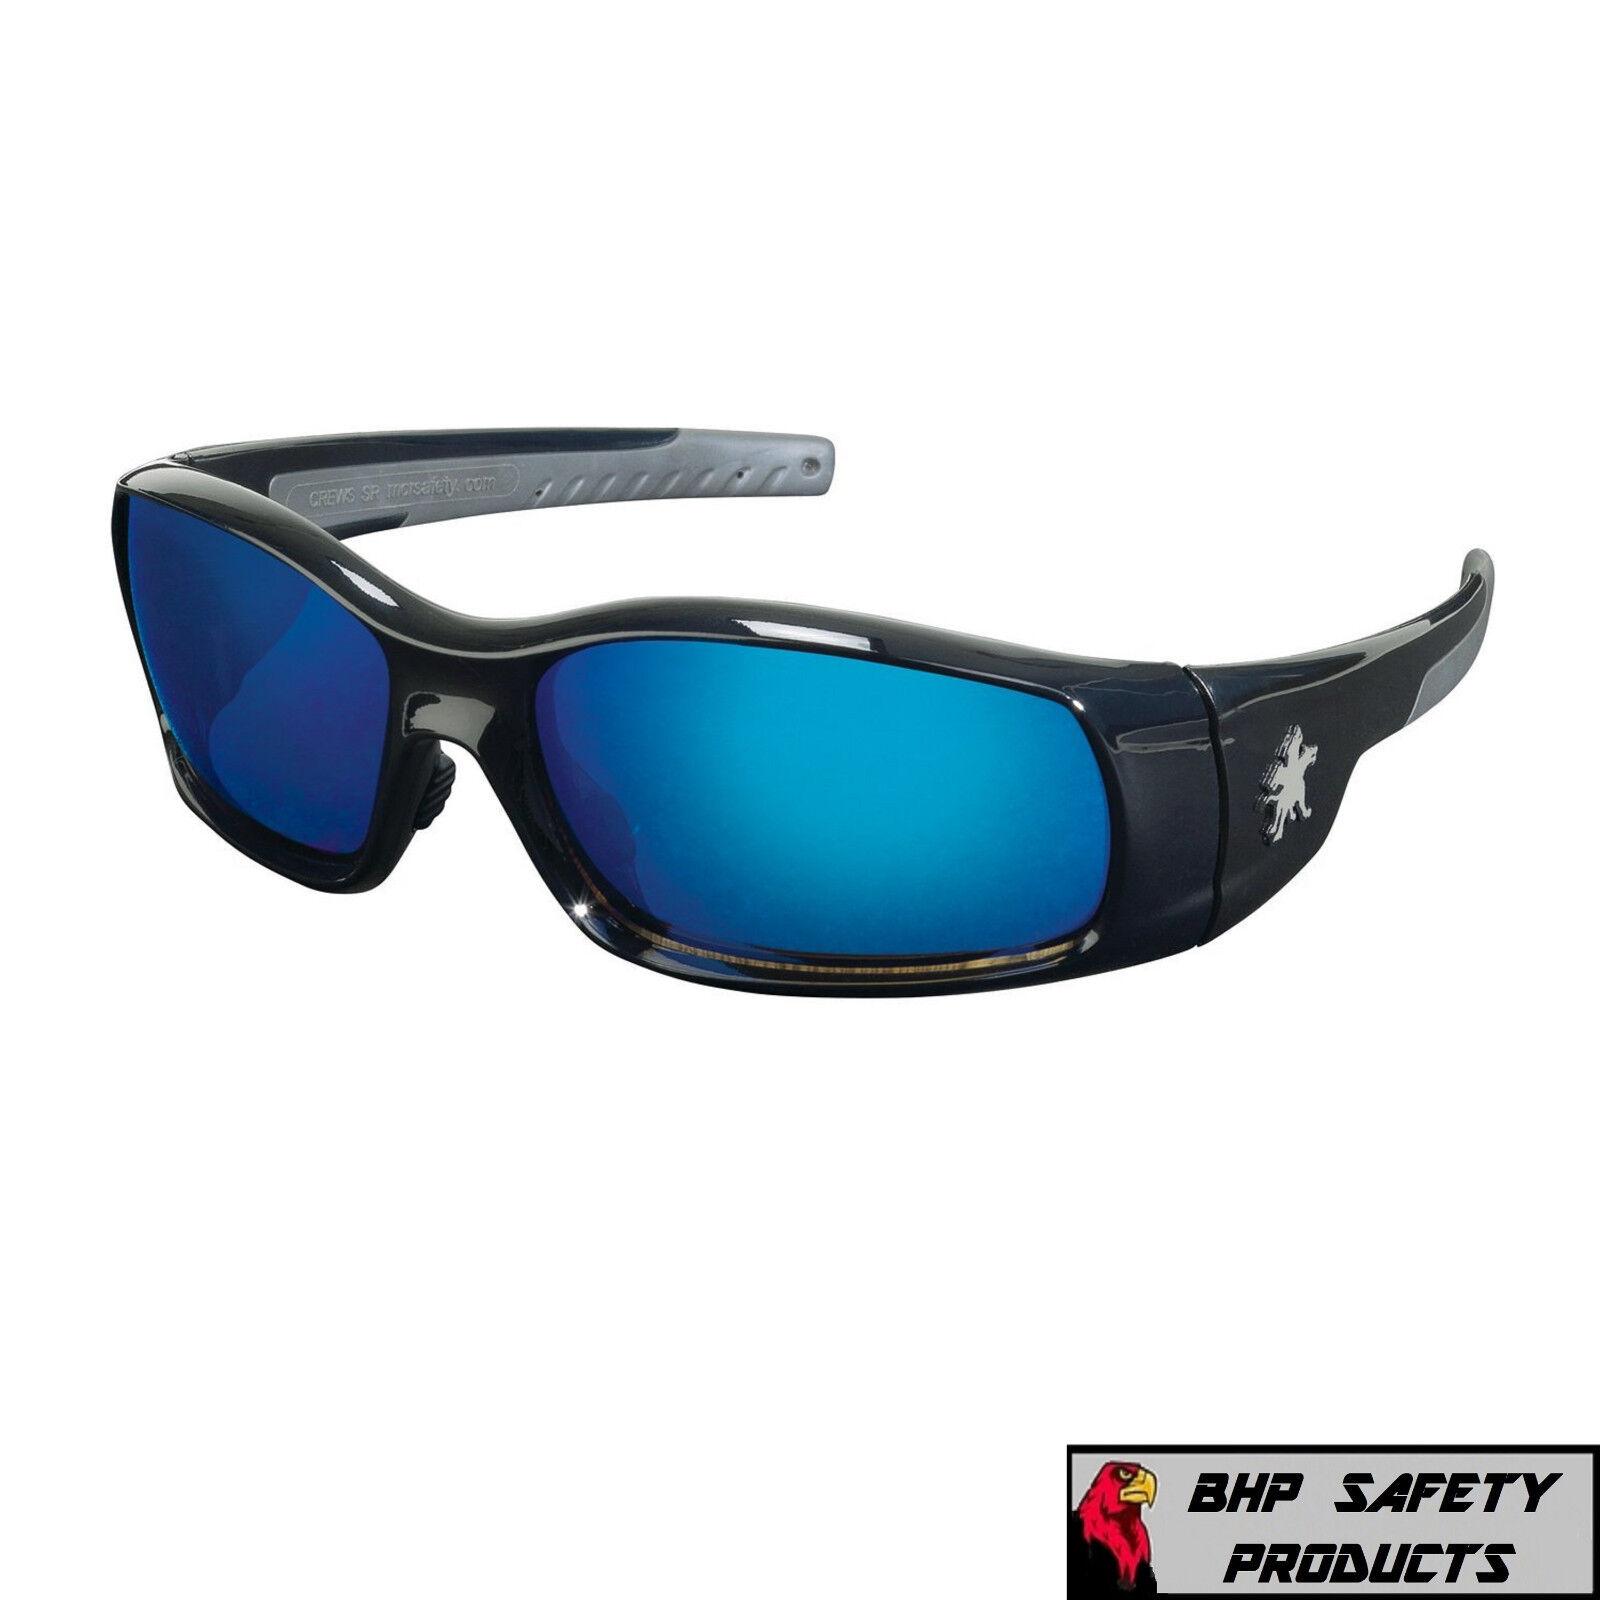 MCR CREWS SWAGGER SAFETY GLASSES SUNGLASSES WORK SPORT EYEWEAR CHOOSE YOUR COLOR SR118B BLUE MIRROR/BLACK FRAME